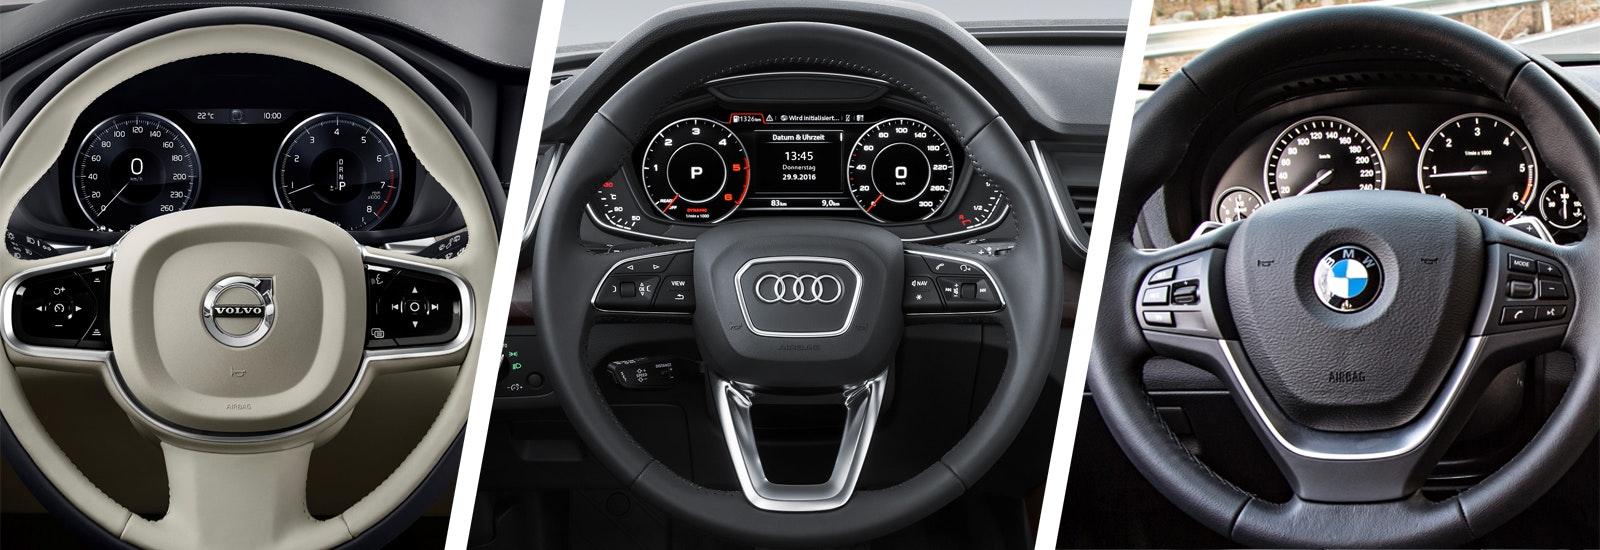 Volvo XC60 vs Audi Q5 vs BMW X3 SUV comparison | carwow